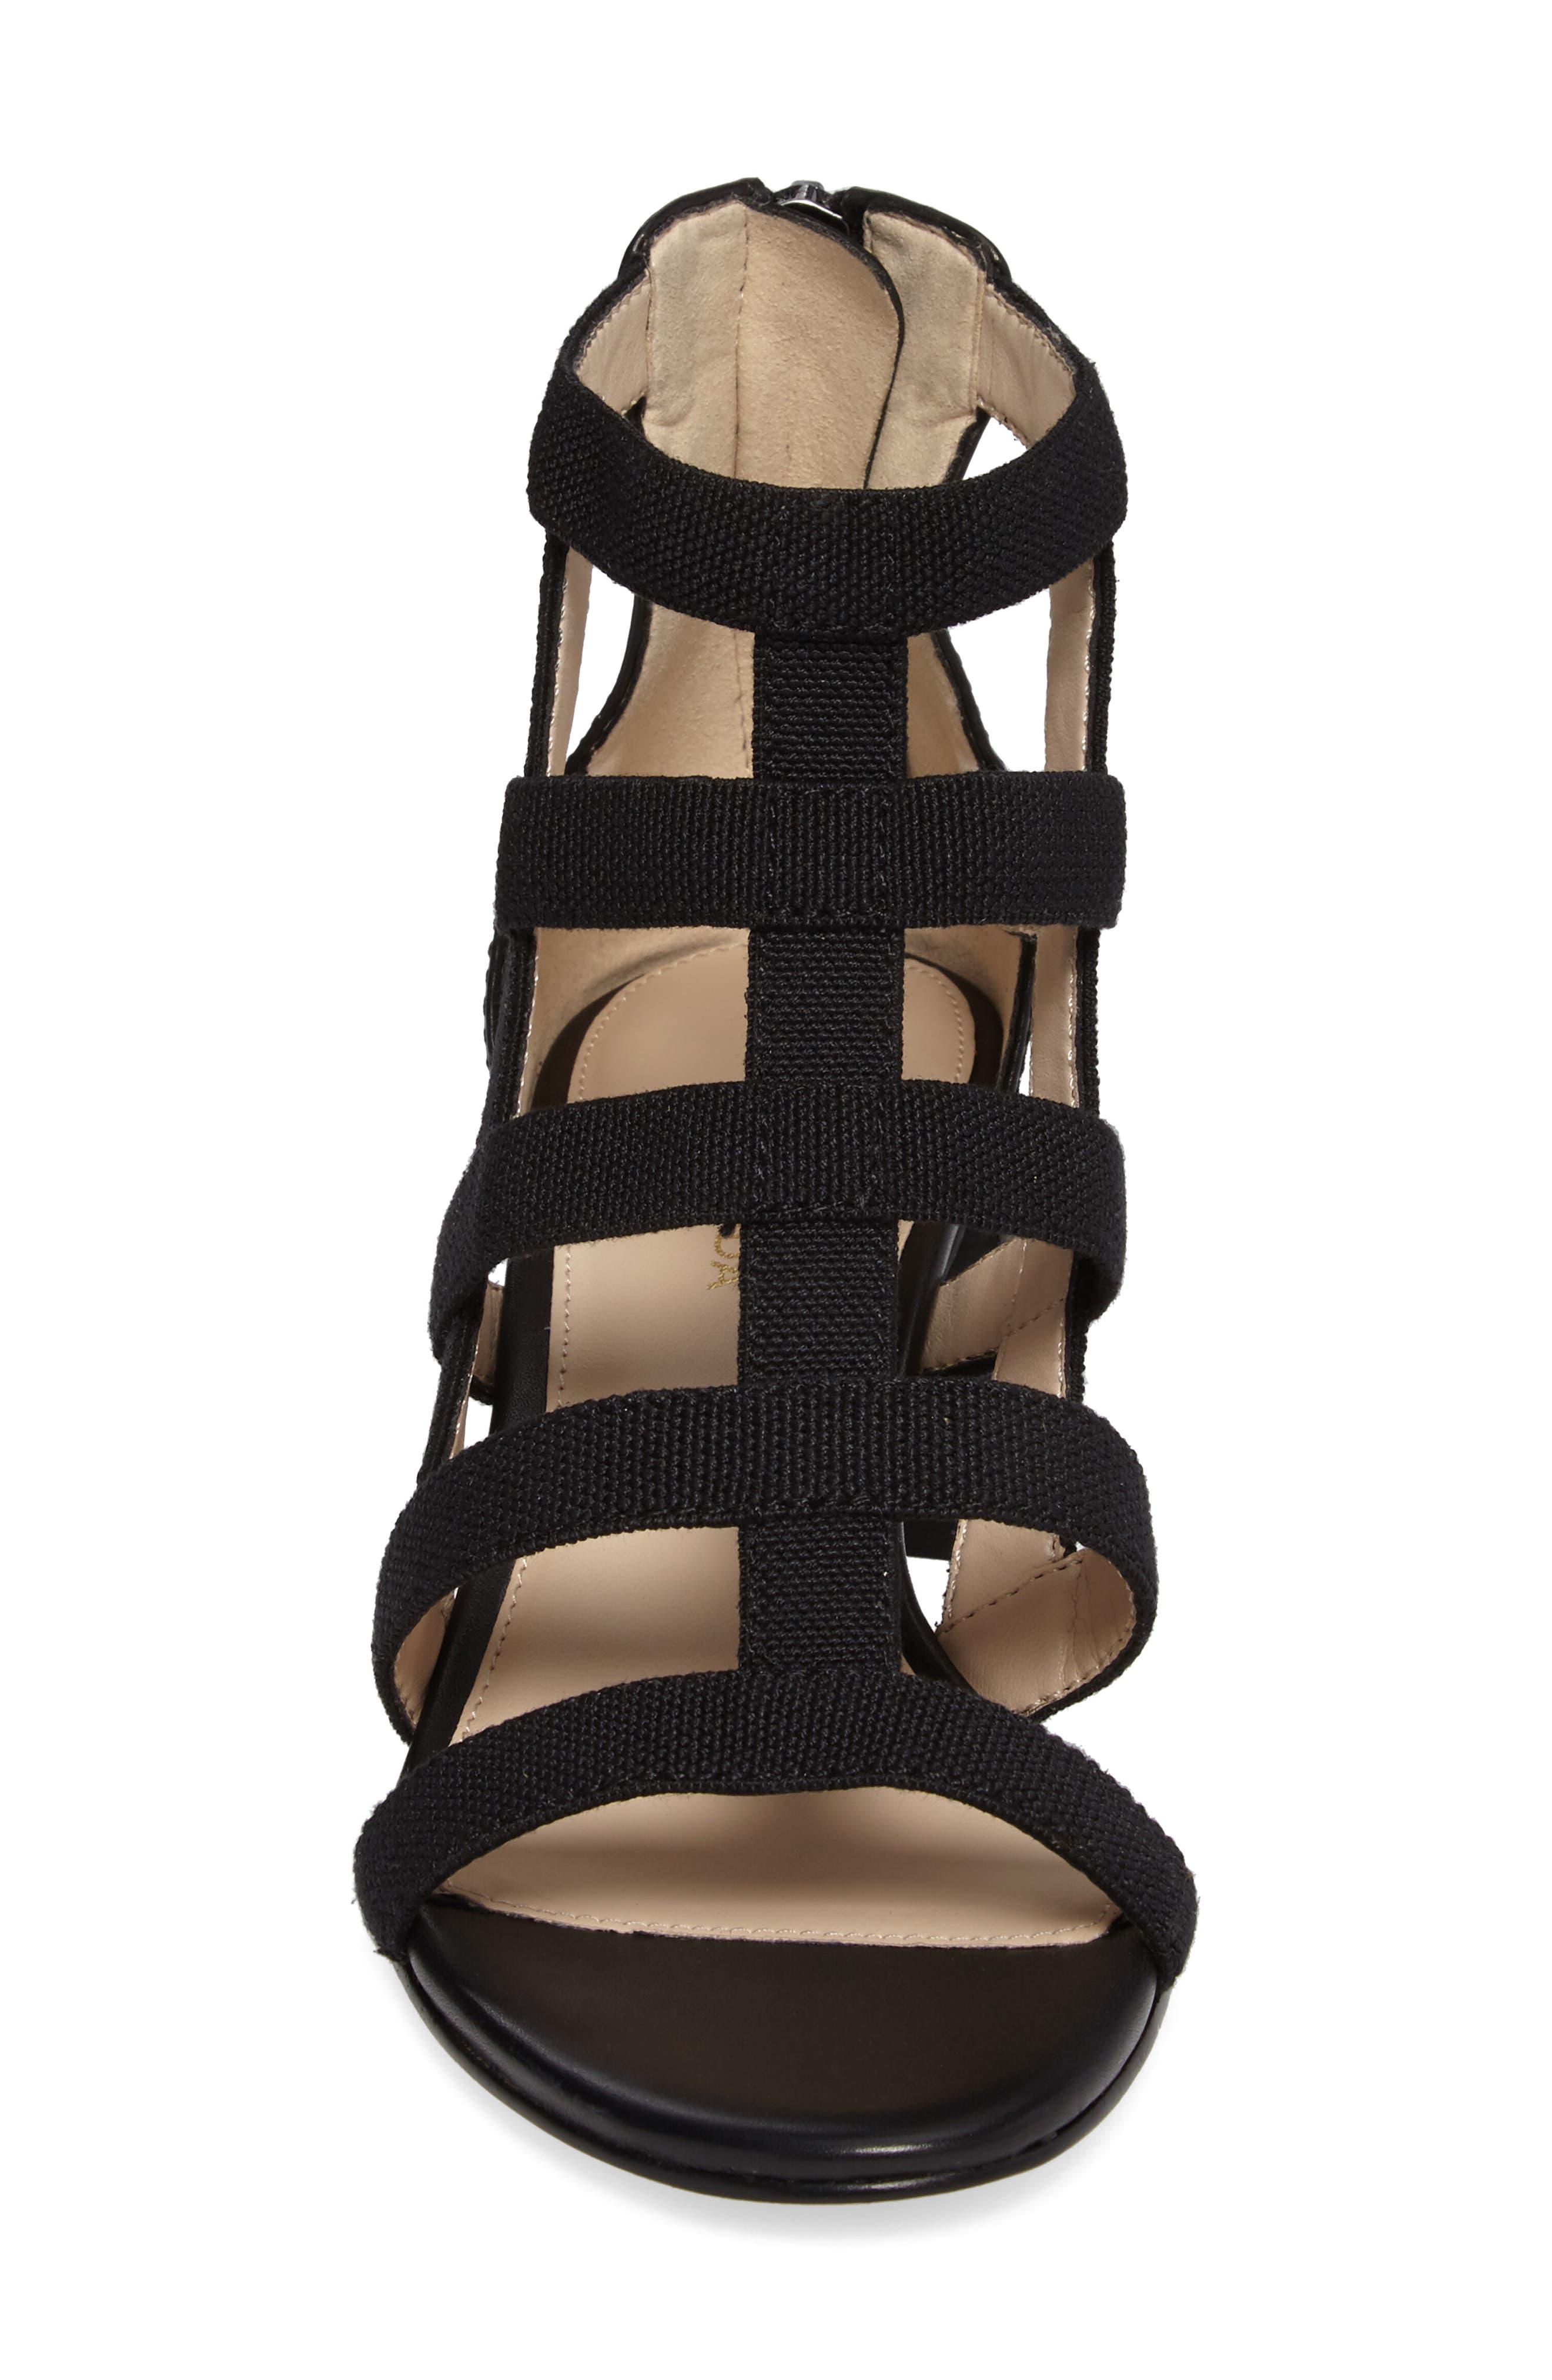 Unkar Block Heel Sandal,                             Alternate thumbnail 4, color,                             001